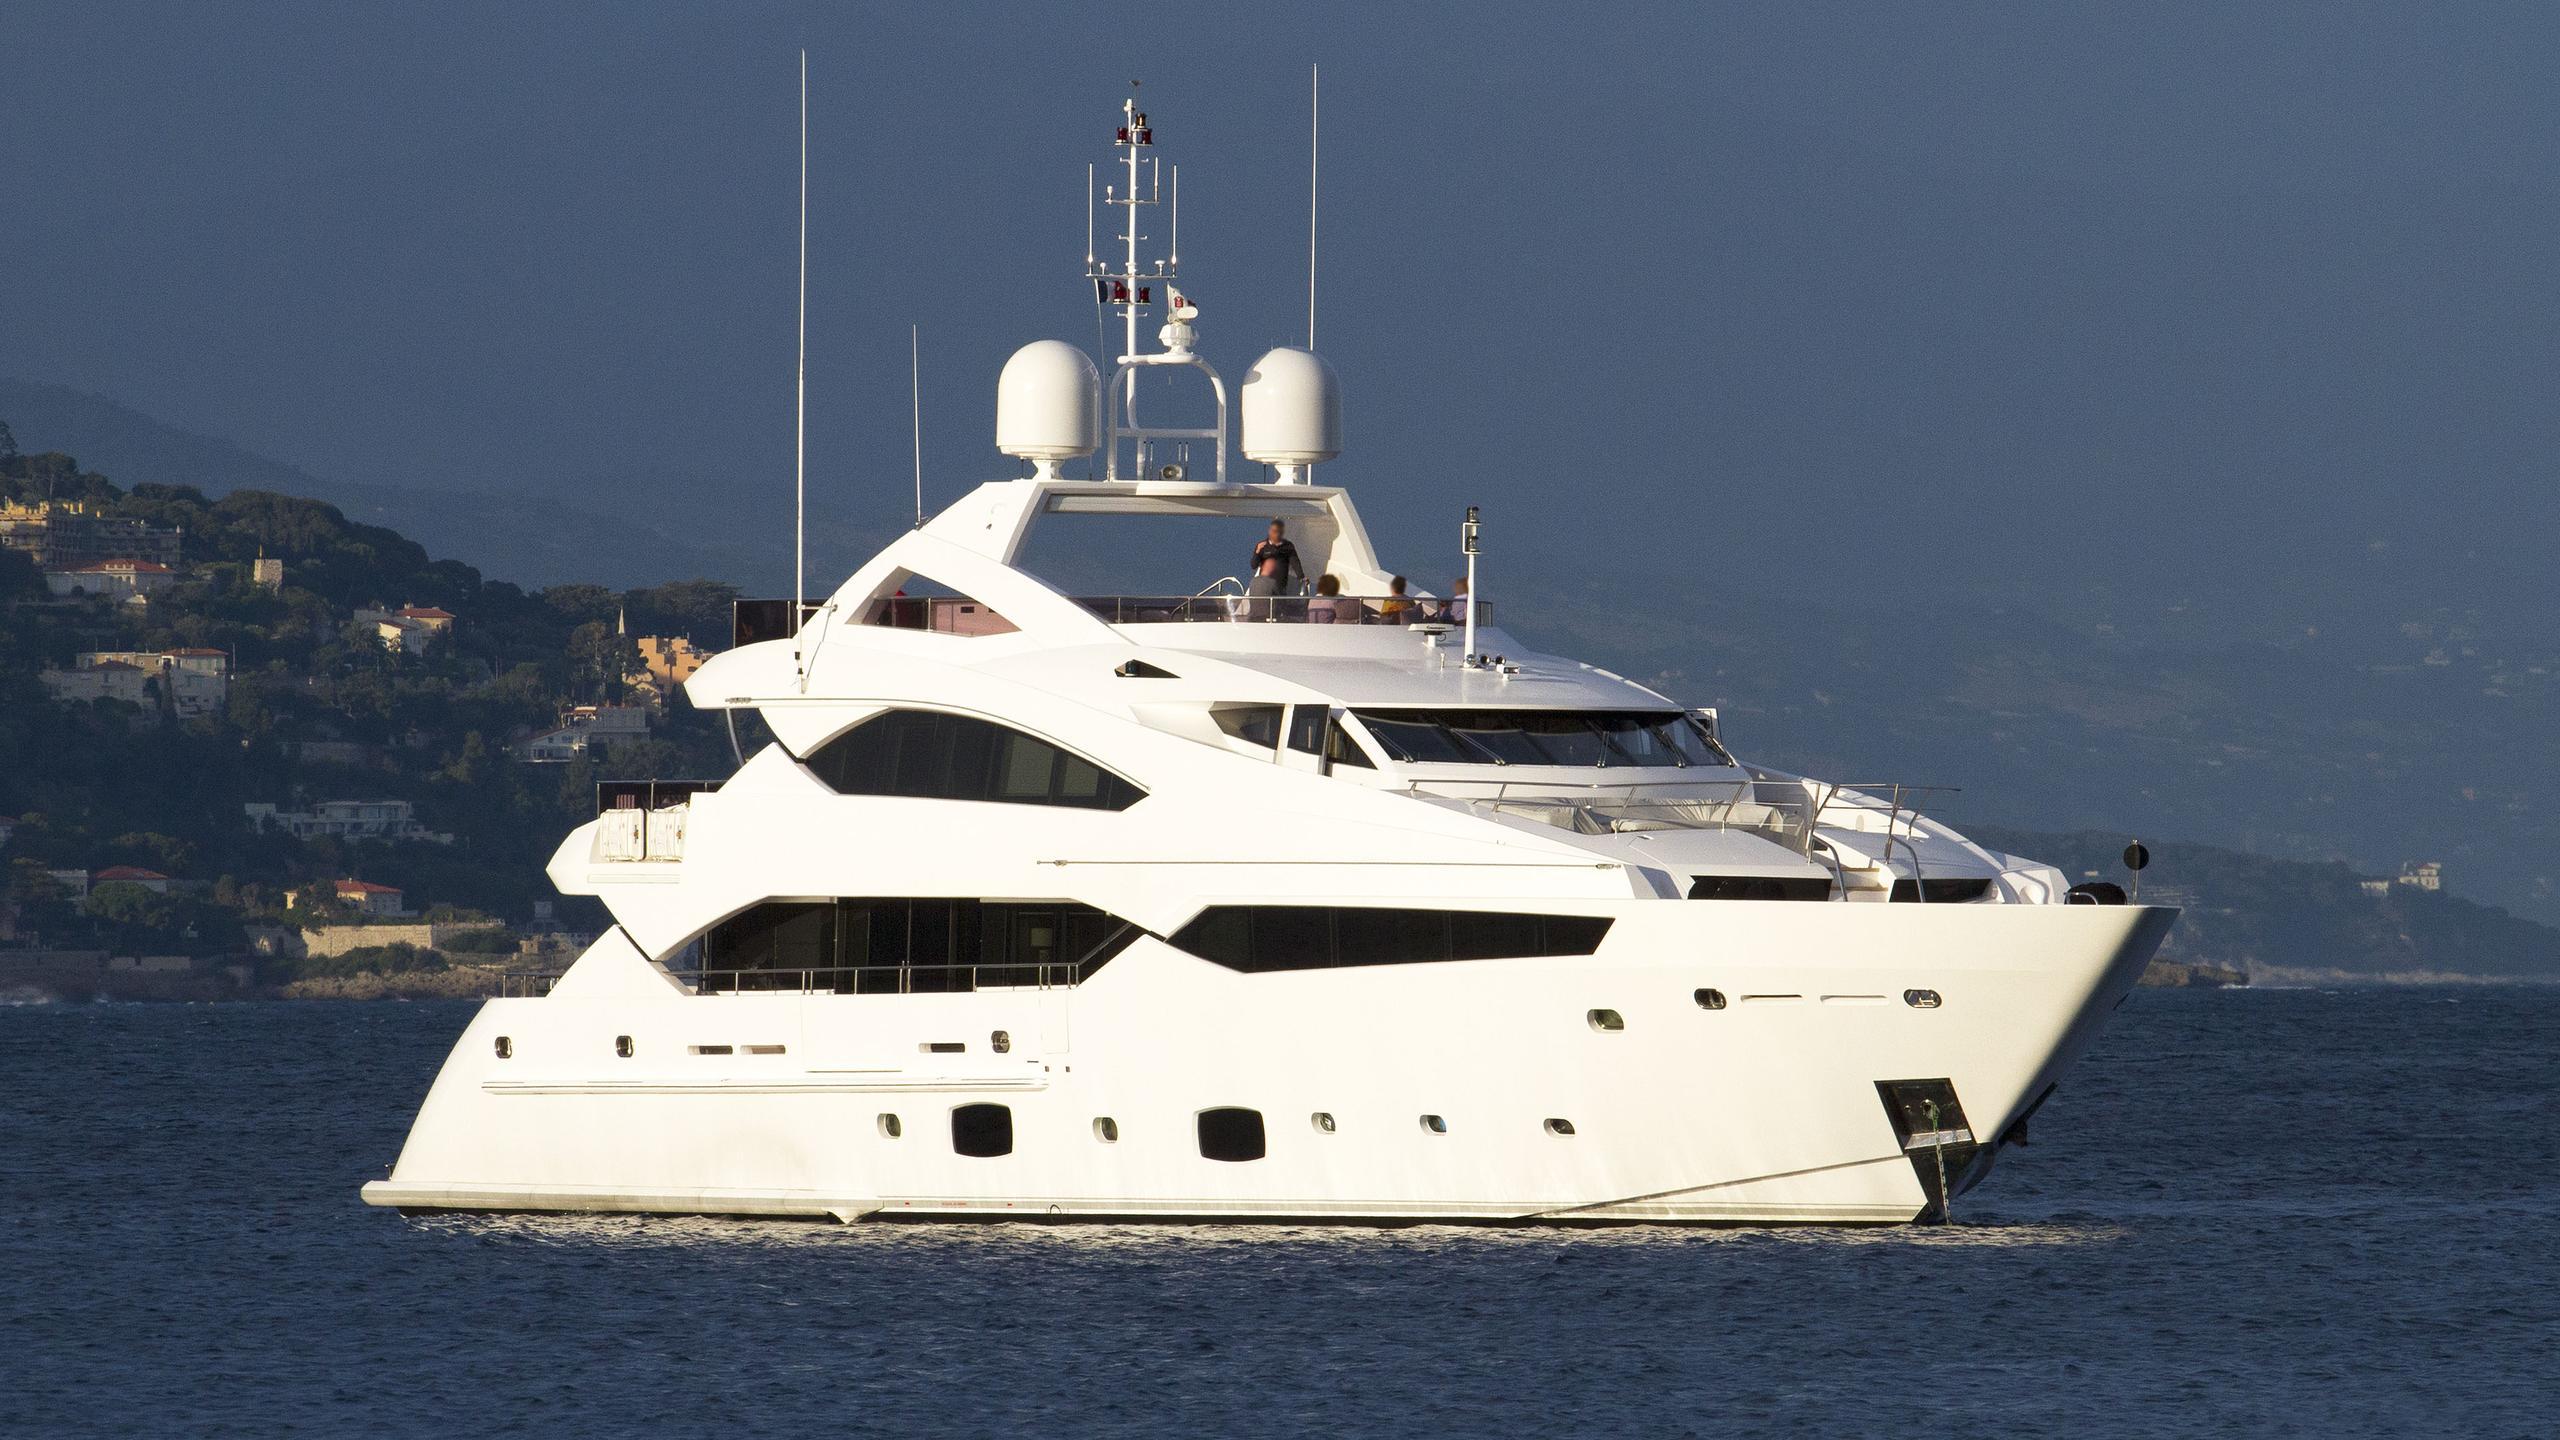 thumper-motor-yacht-sunseeker-40M-2014-40m-half-profile